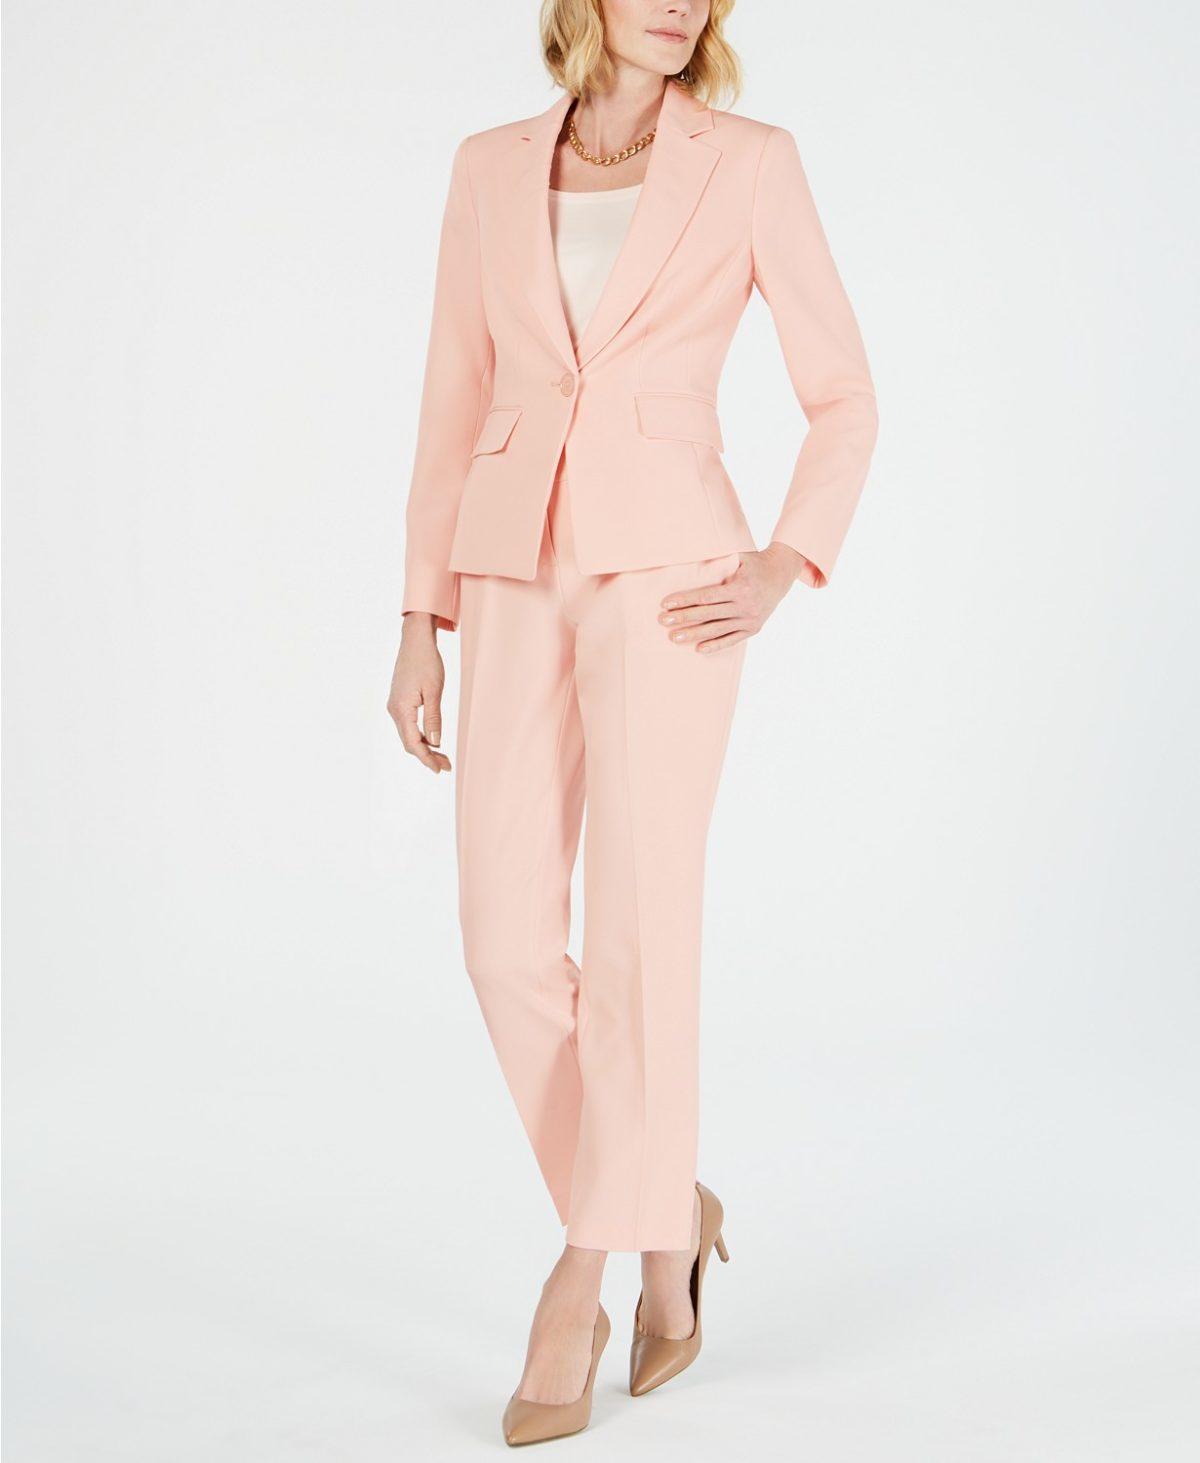 pastel-pants-suit-easter-fashion-for-women